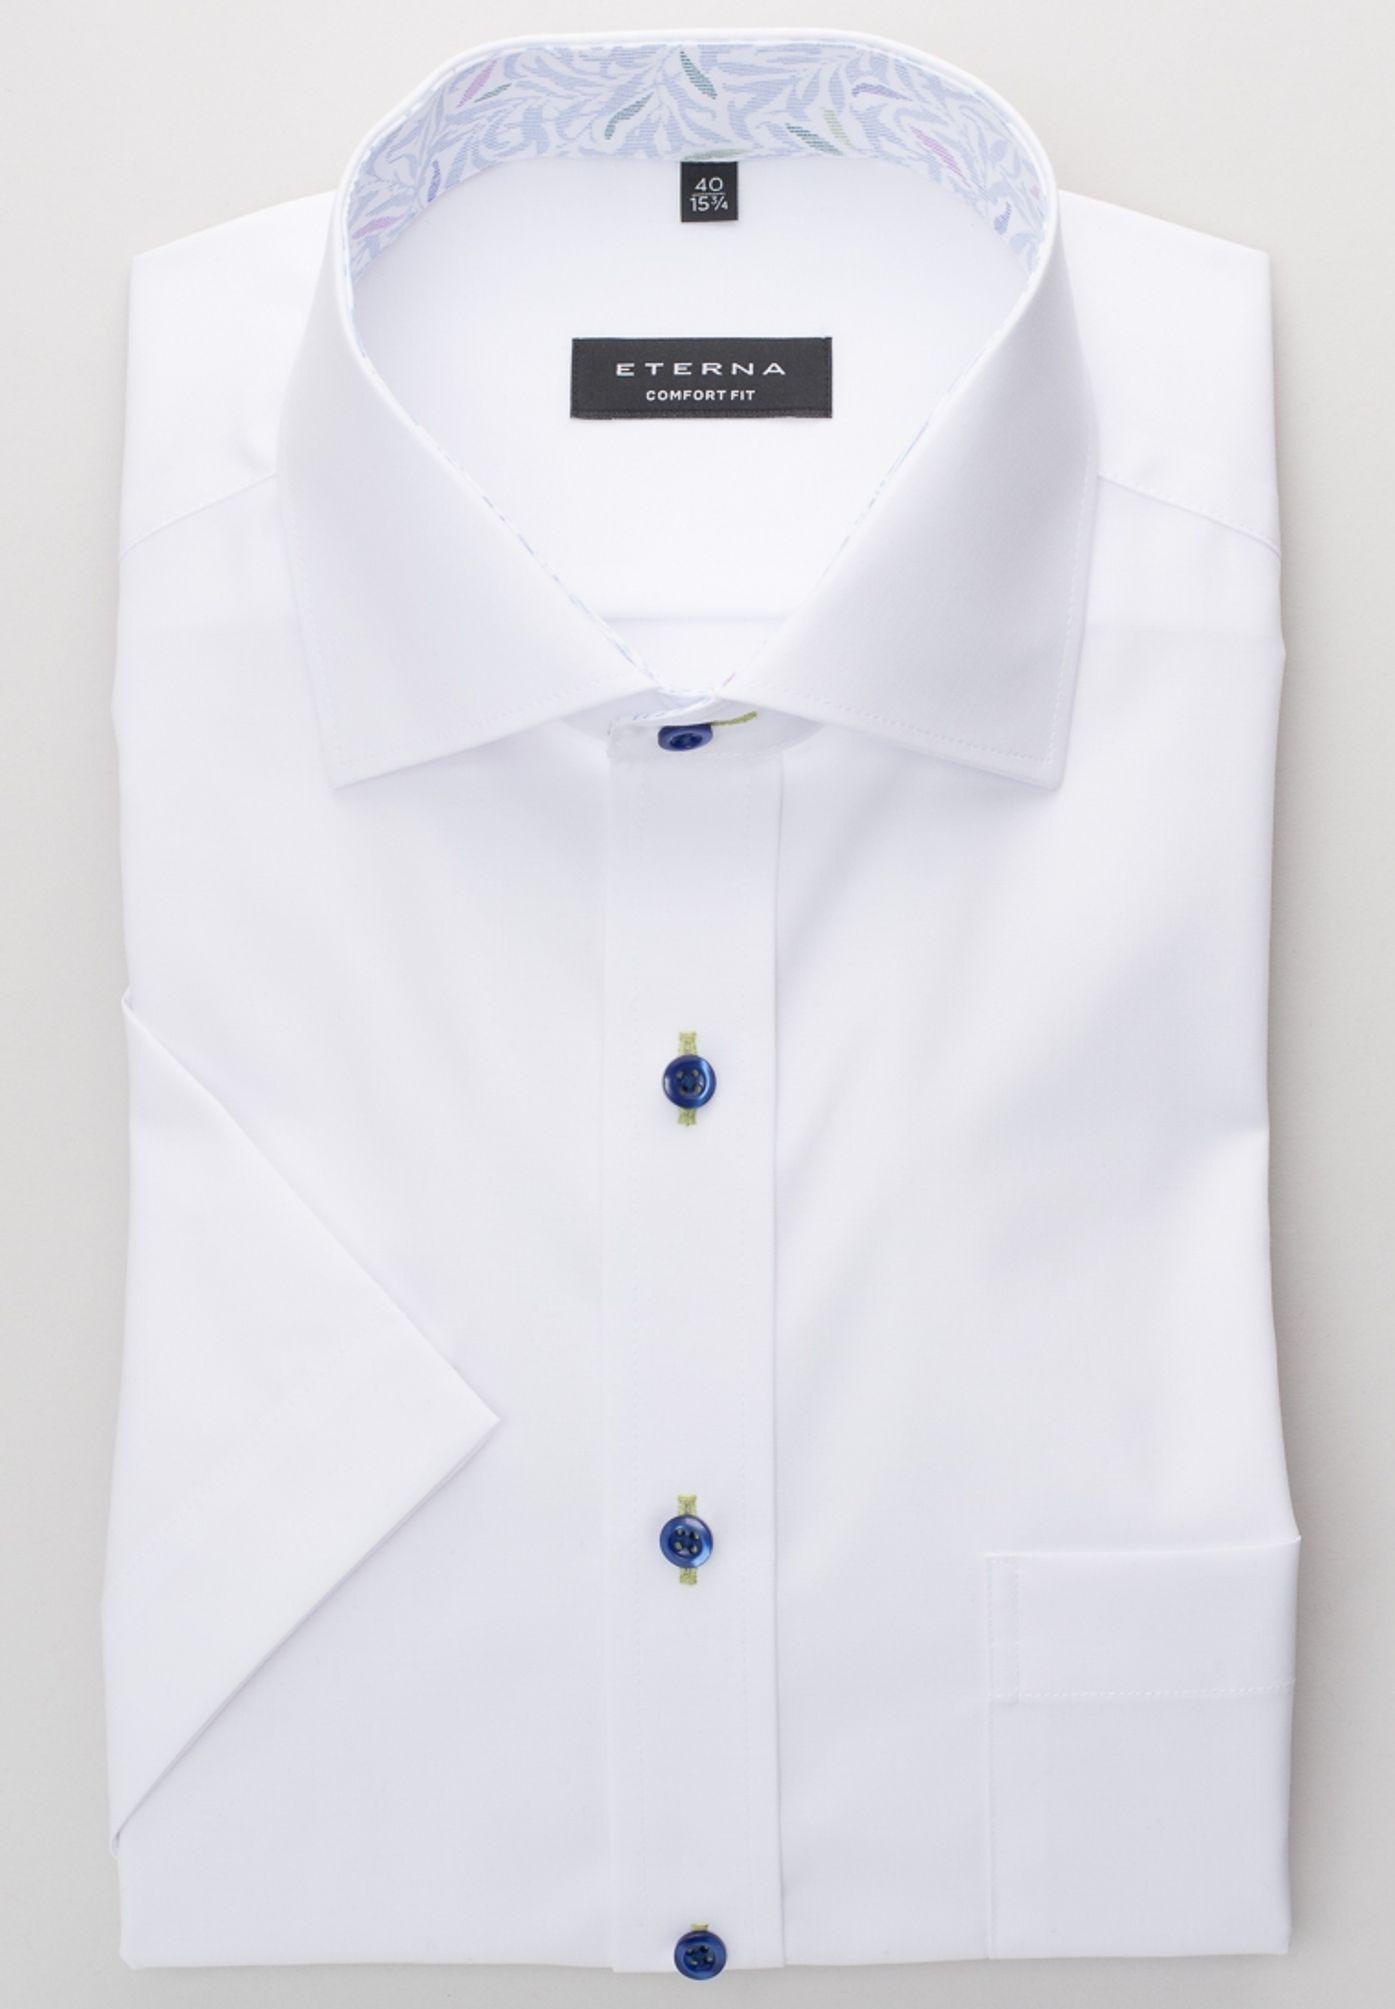 Eterna - Comfort Fit - Bügelfreies Herren Kurzarm Hemd mit Button-Down  Kragen (8505 46451e329f